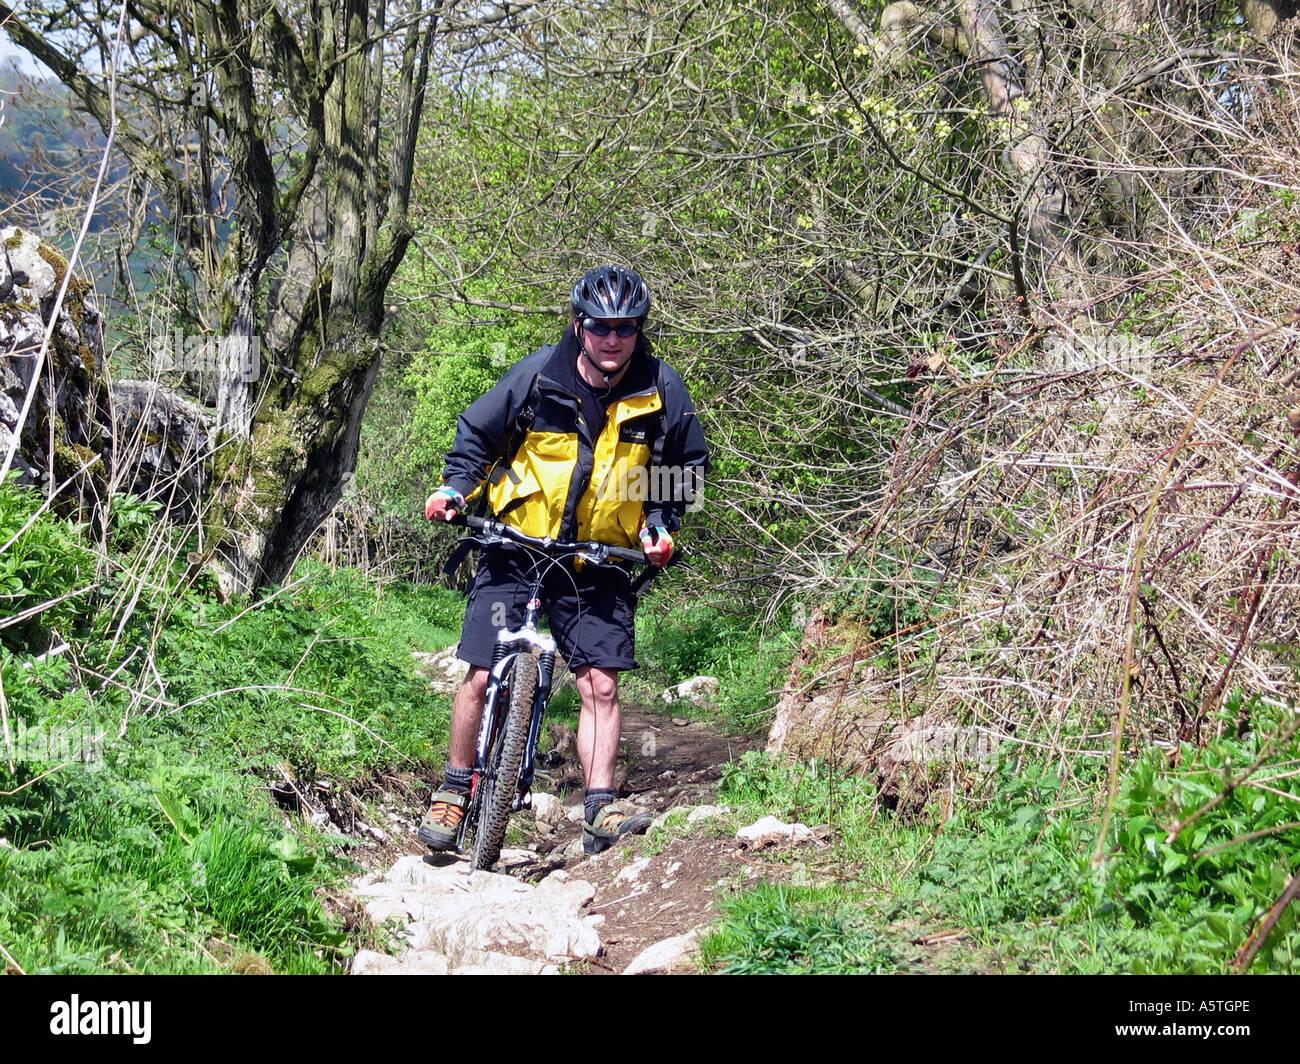 Bike riding High Peak Trail, Peak District, Derbyshire, Great Britain - Stock Image